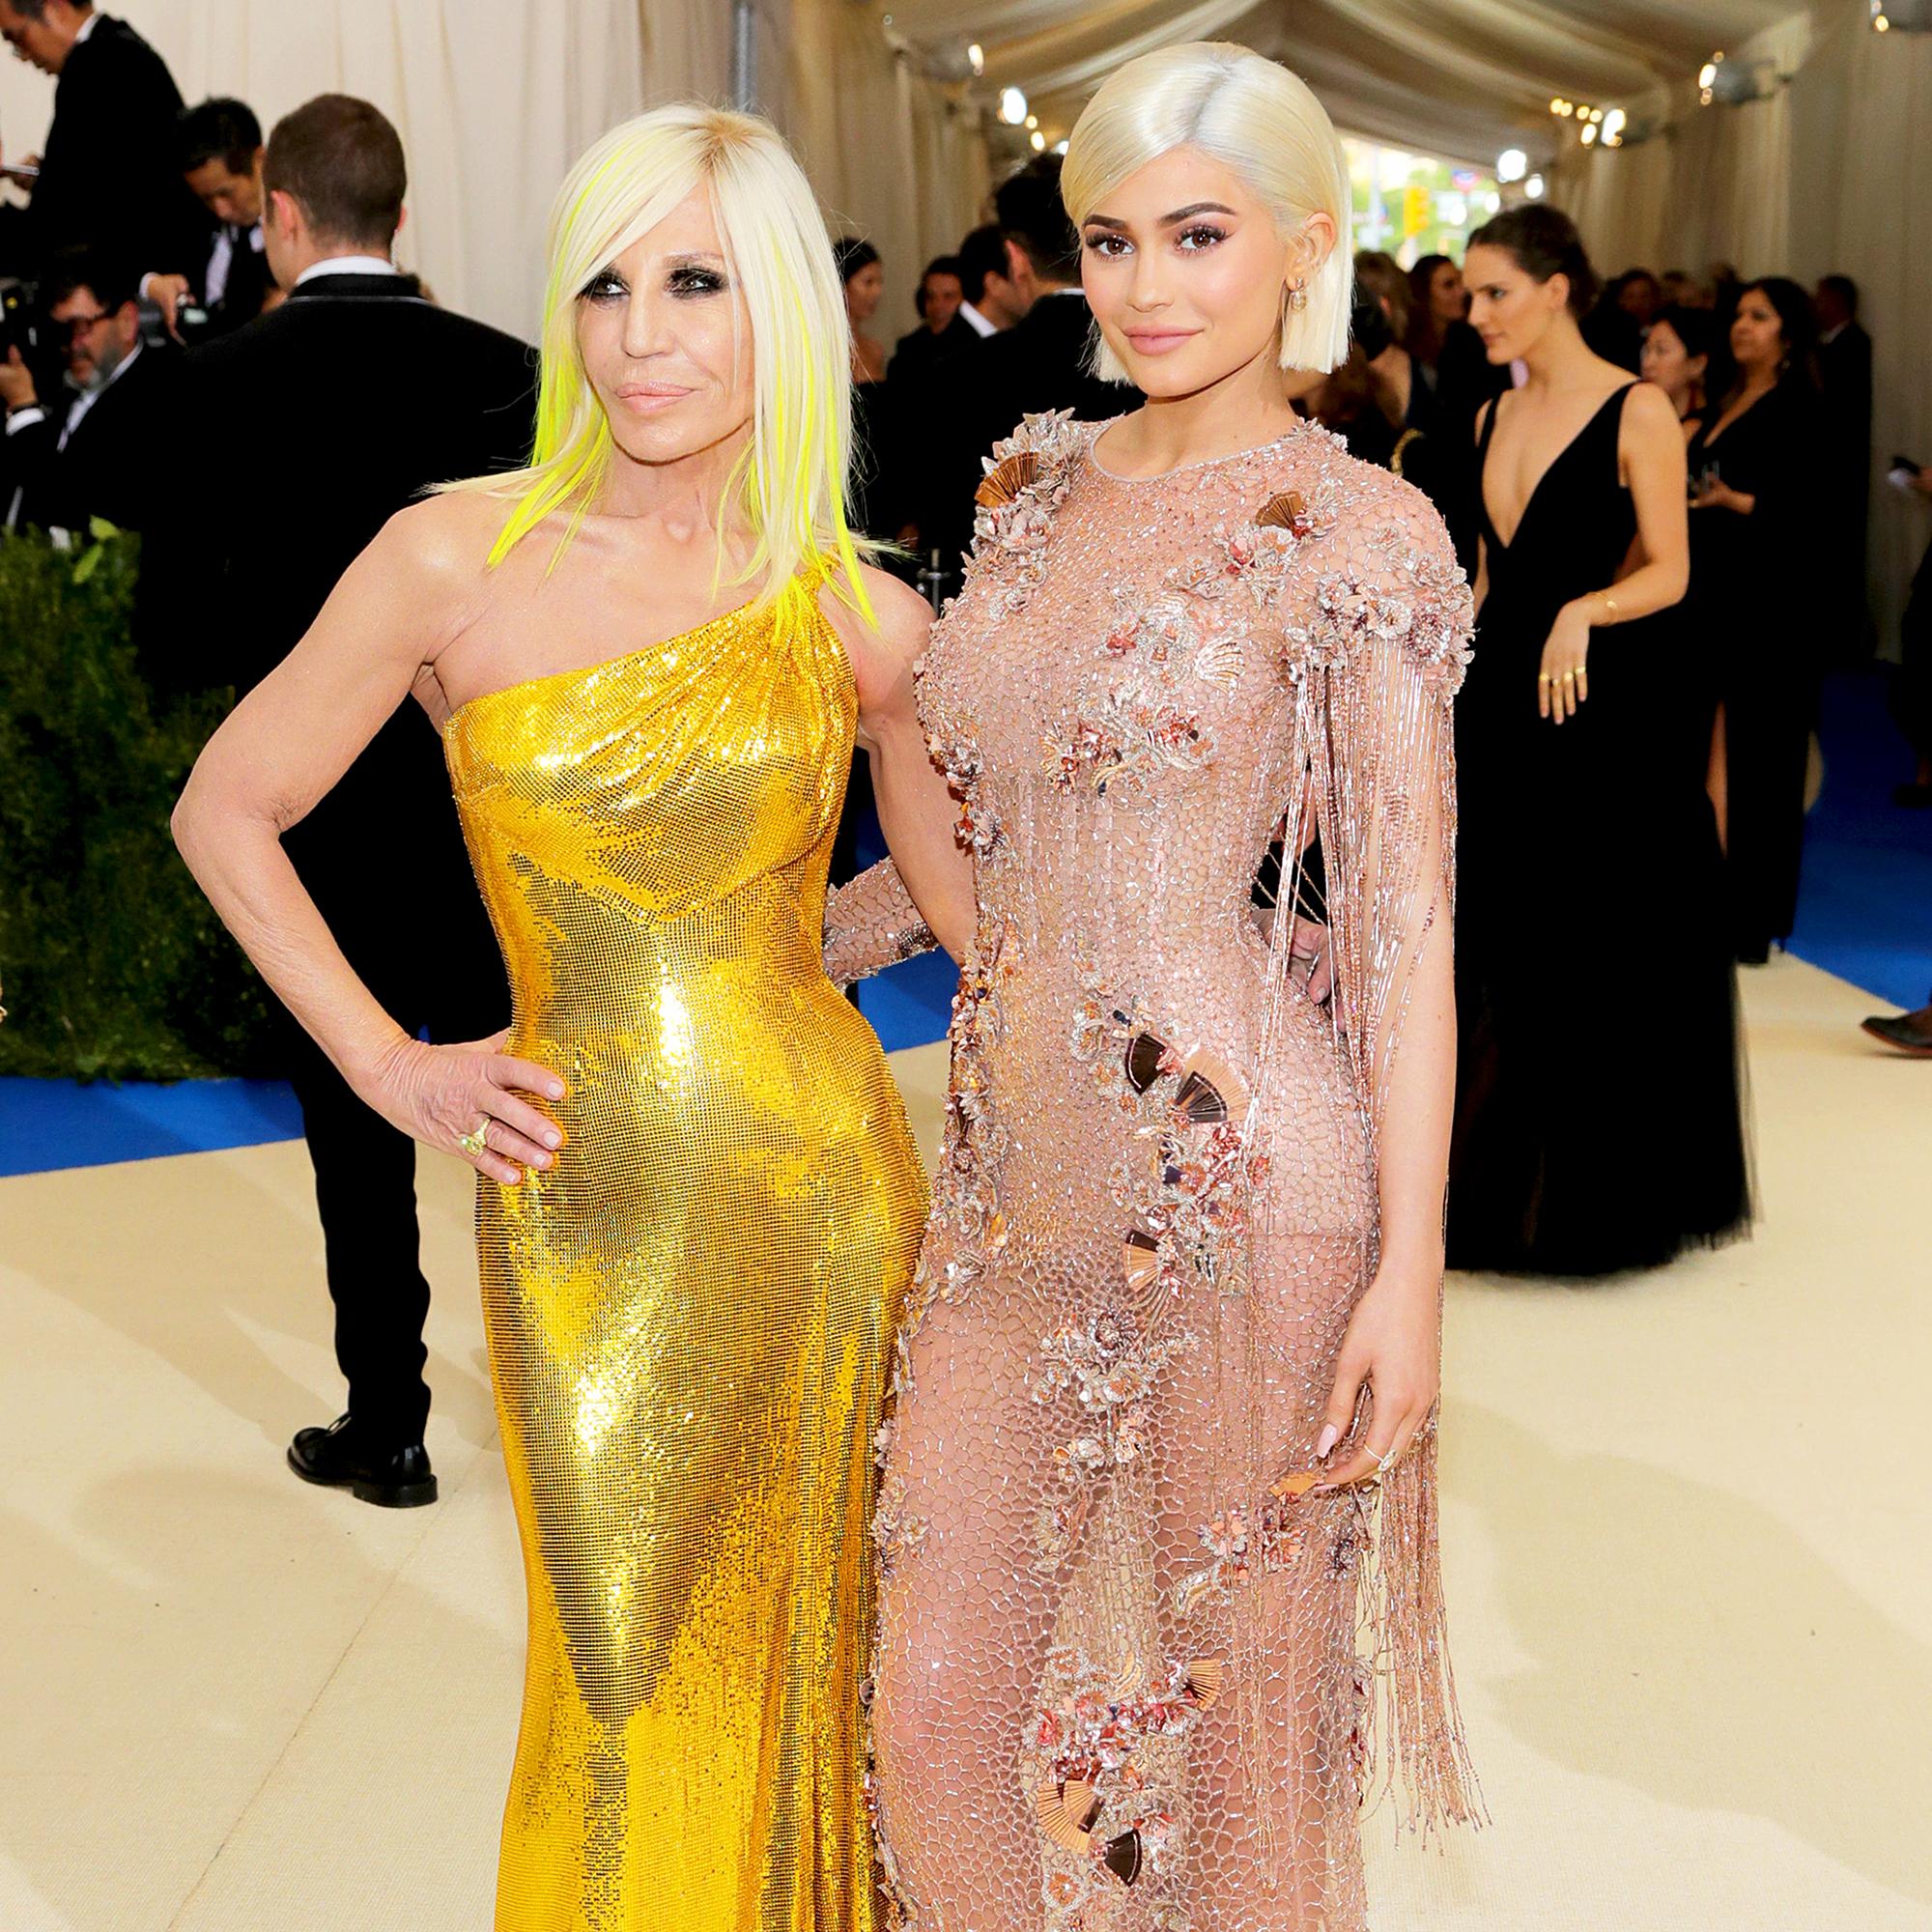 Donatella Versace and Kylie Jenner